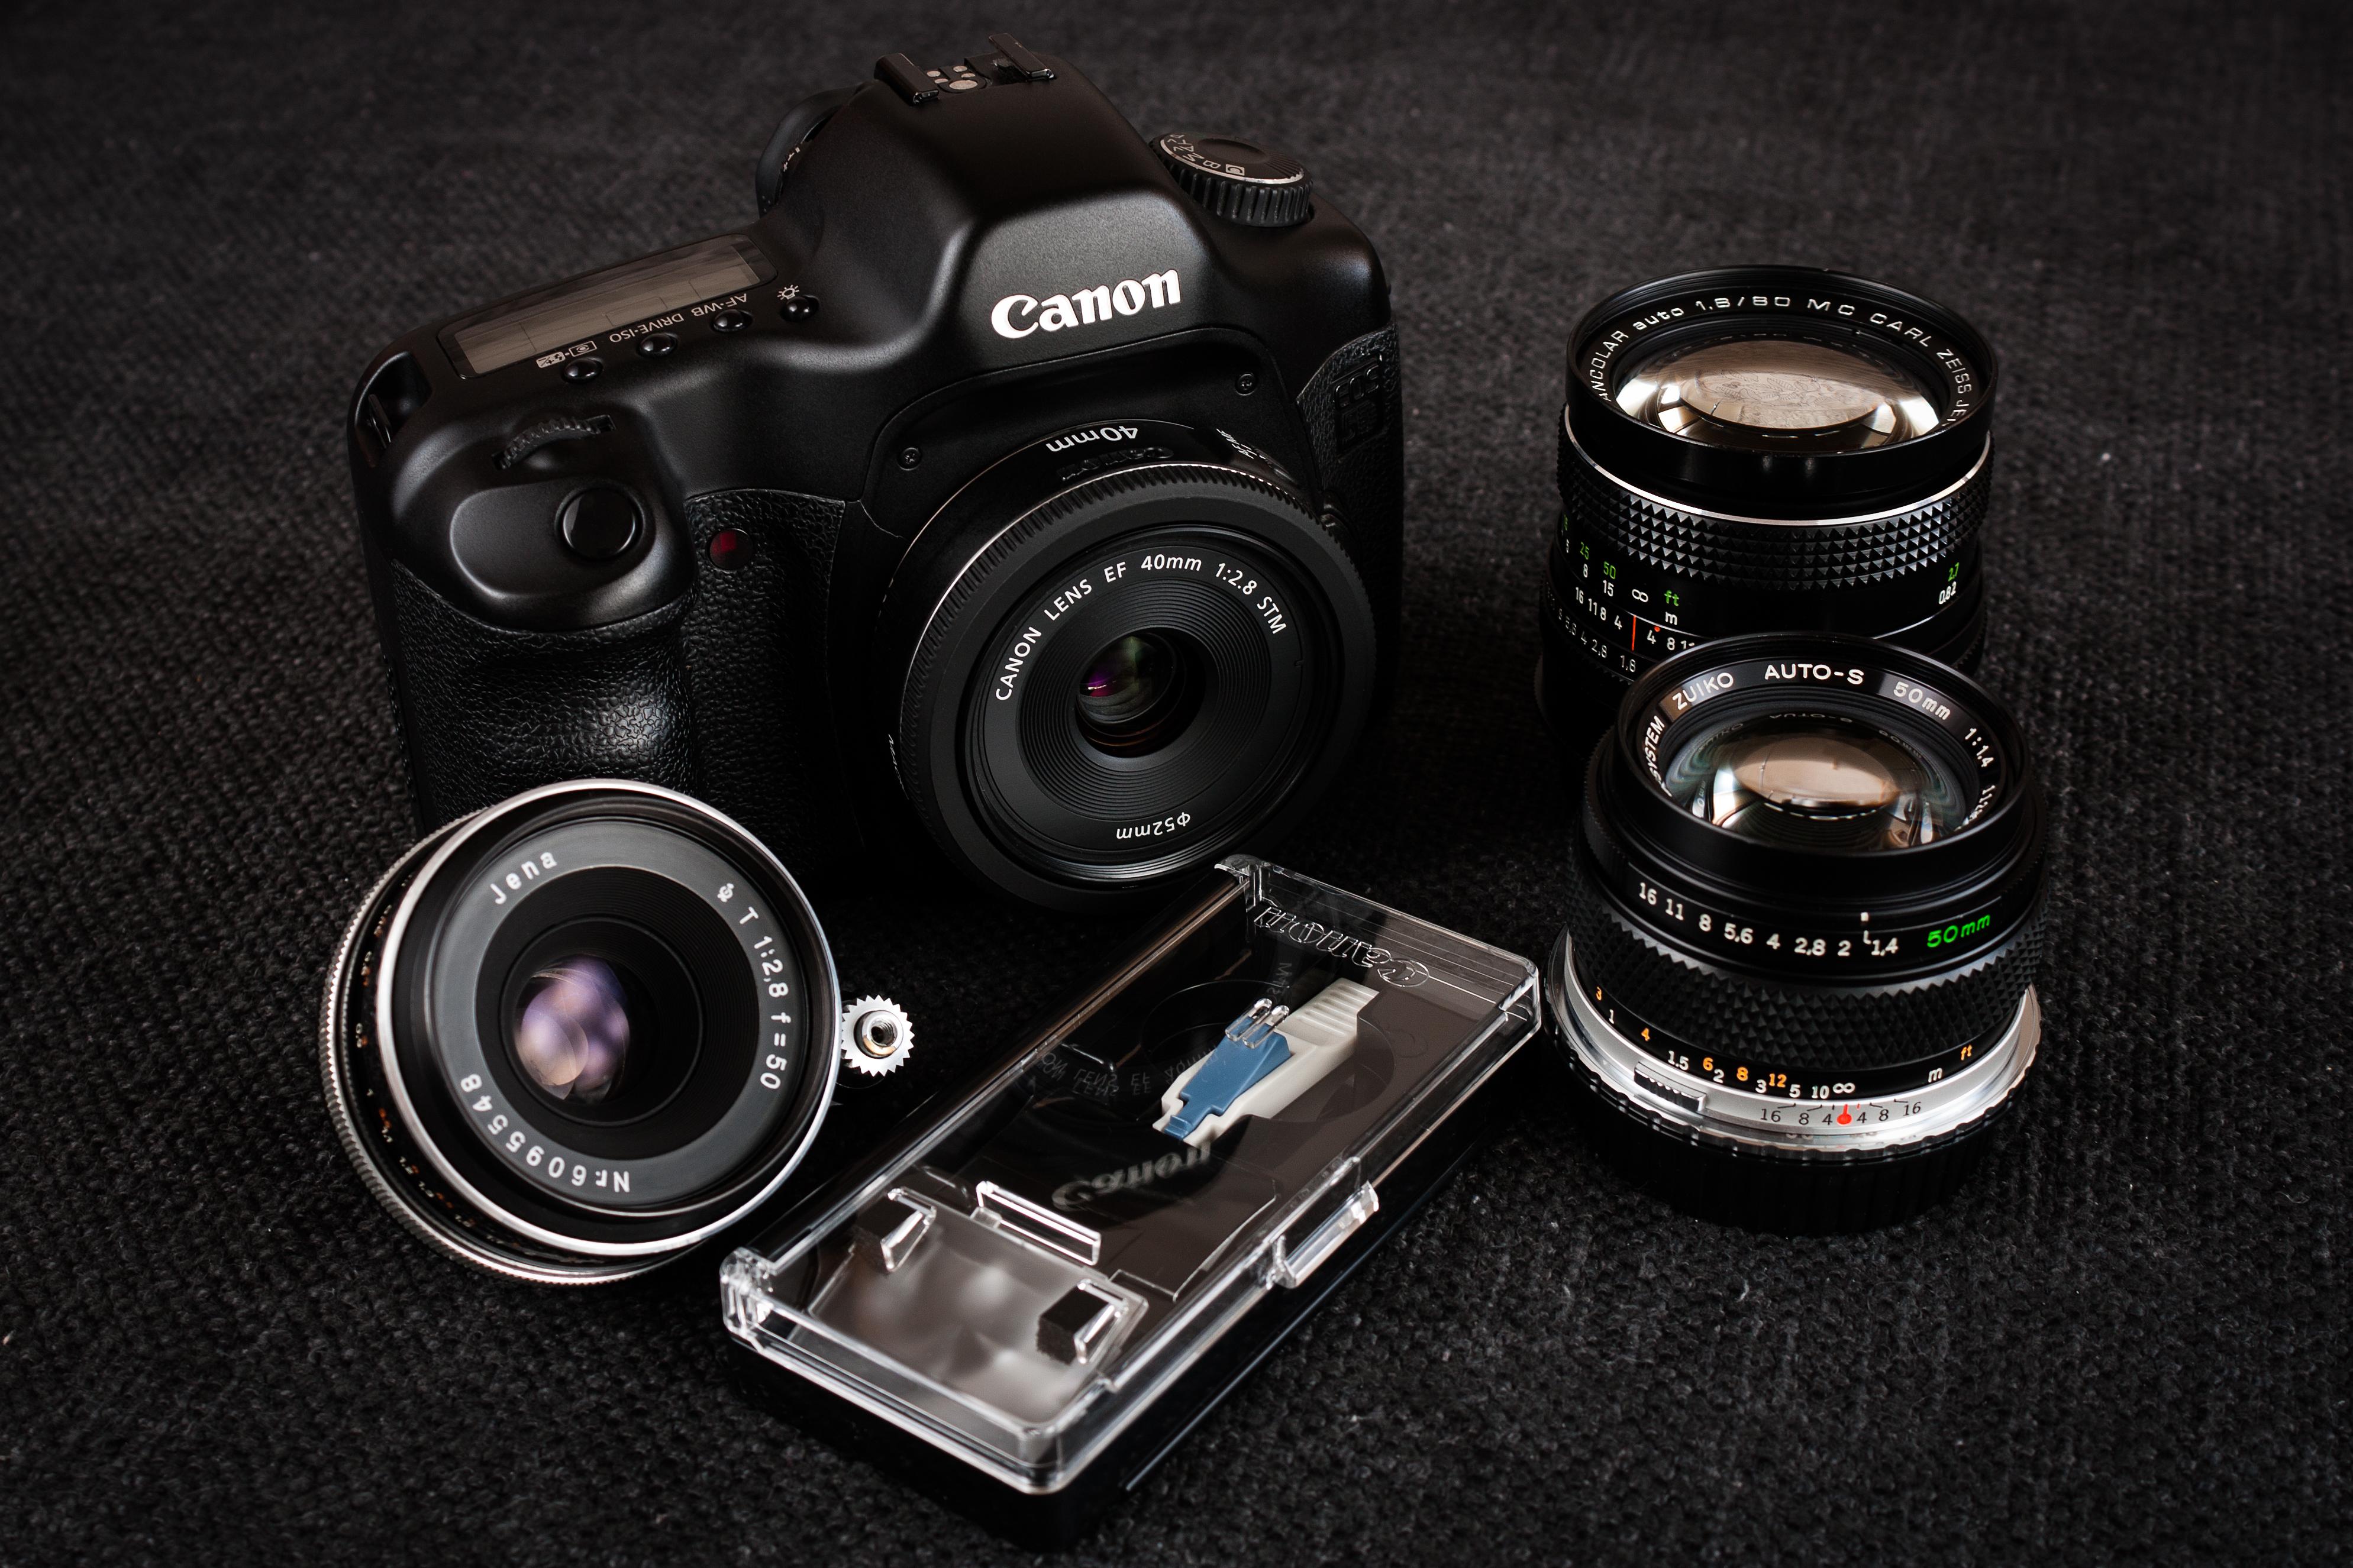 Canon EOES 5D, Canon 40mm f/2.8, Carl Zeiss Jena Pancolar 80mm f/1.8 (M42), Olympus Zuiko 50mm f/1.4 (Olympus OM), Carl Zeiss Jena Tessar 50mm f/2.8 (Exa)